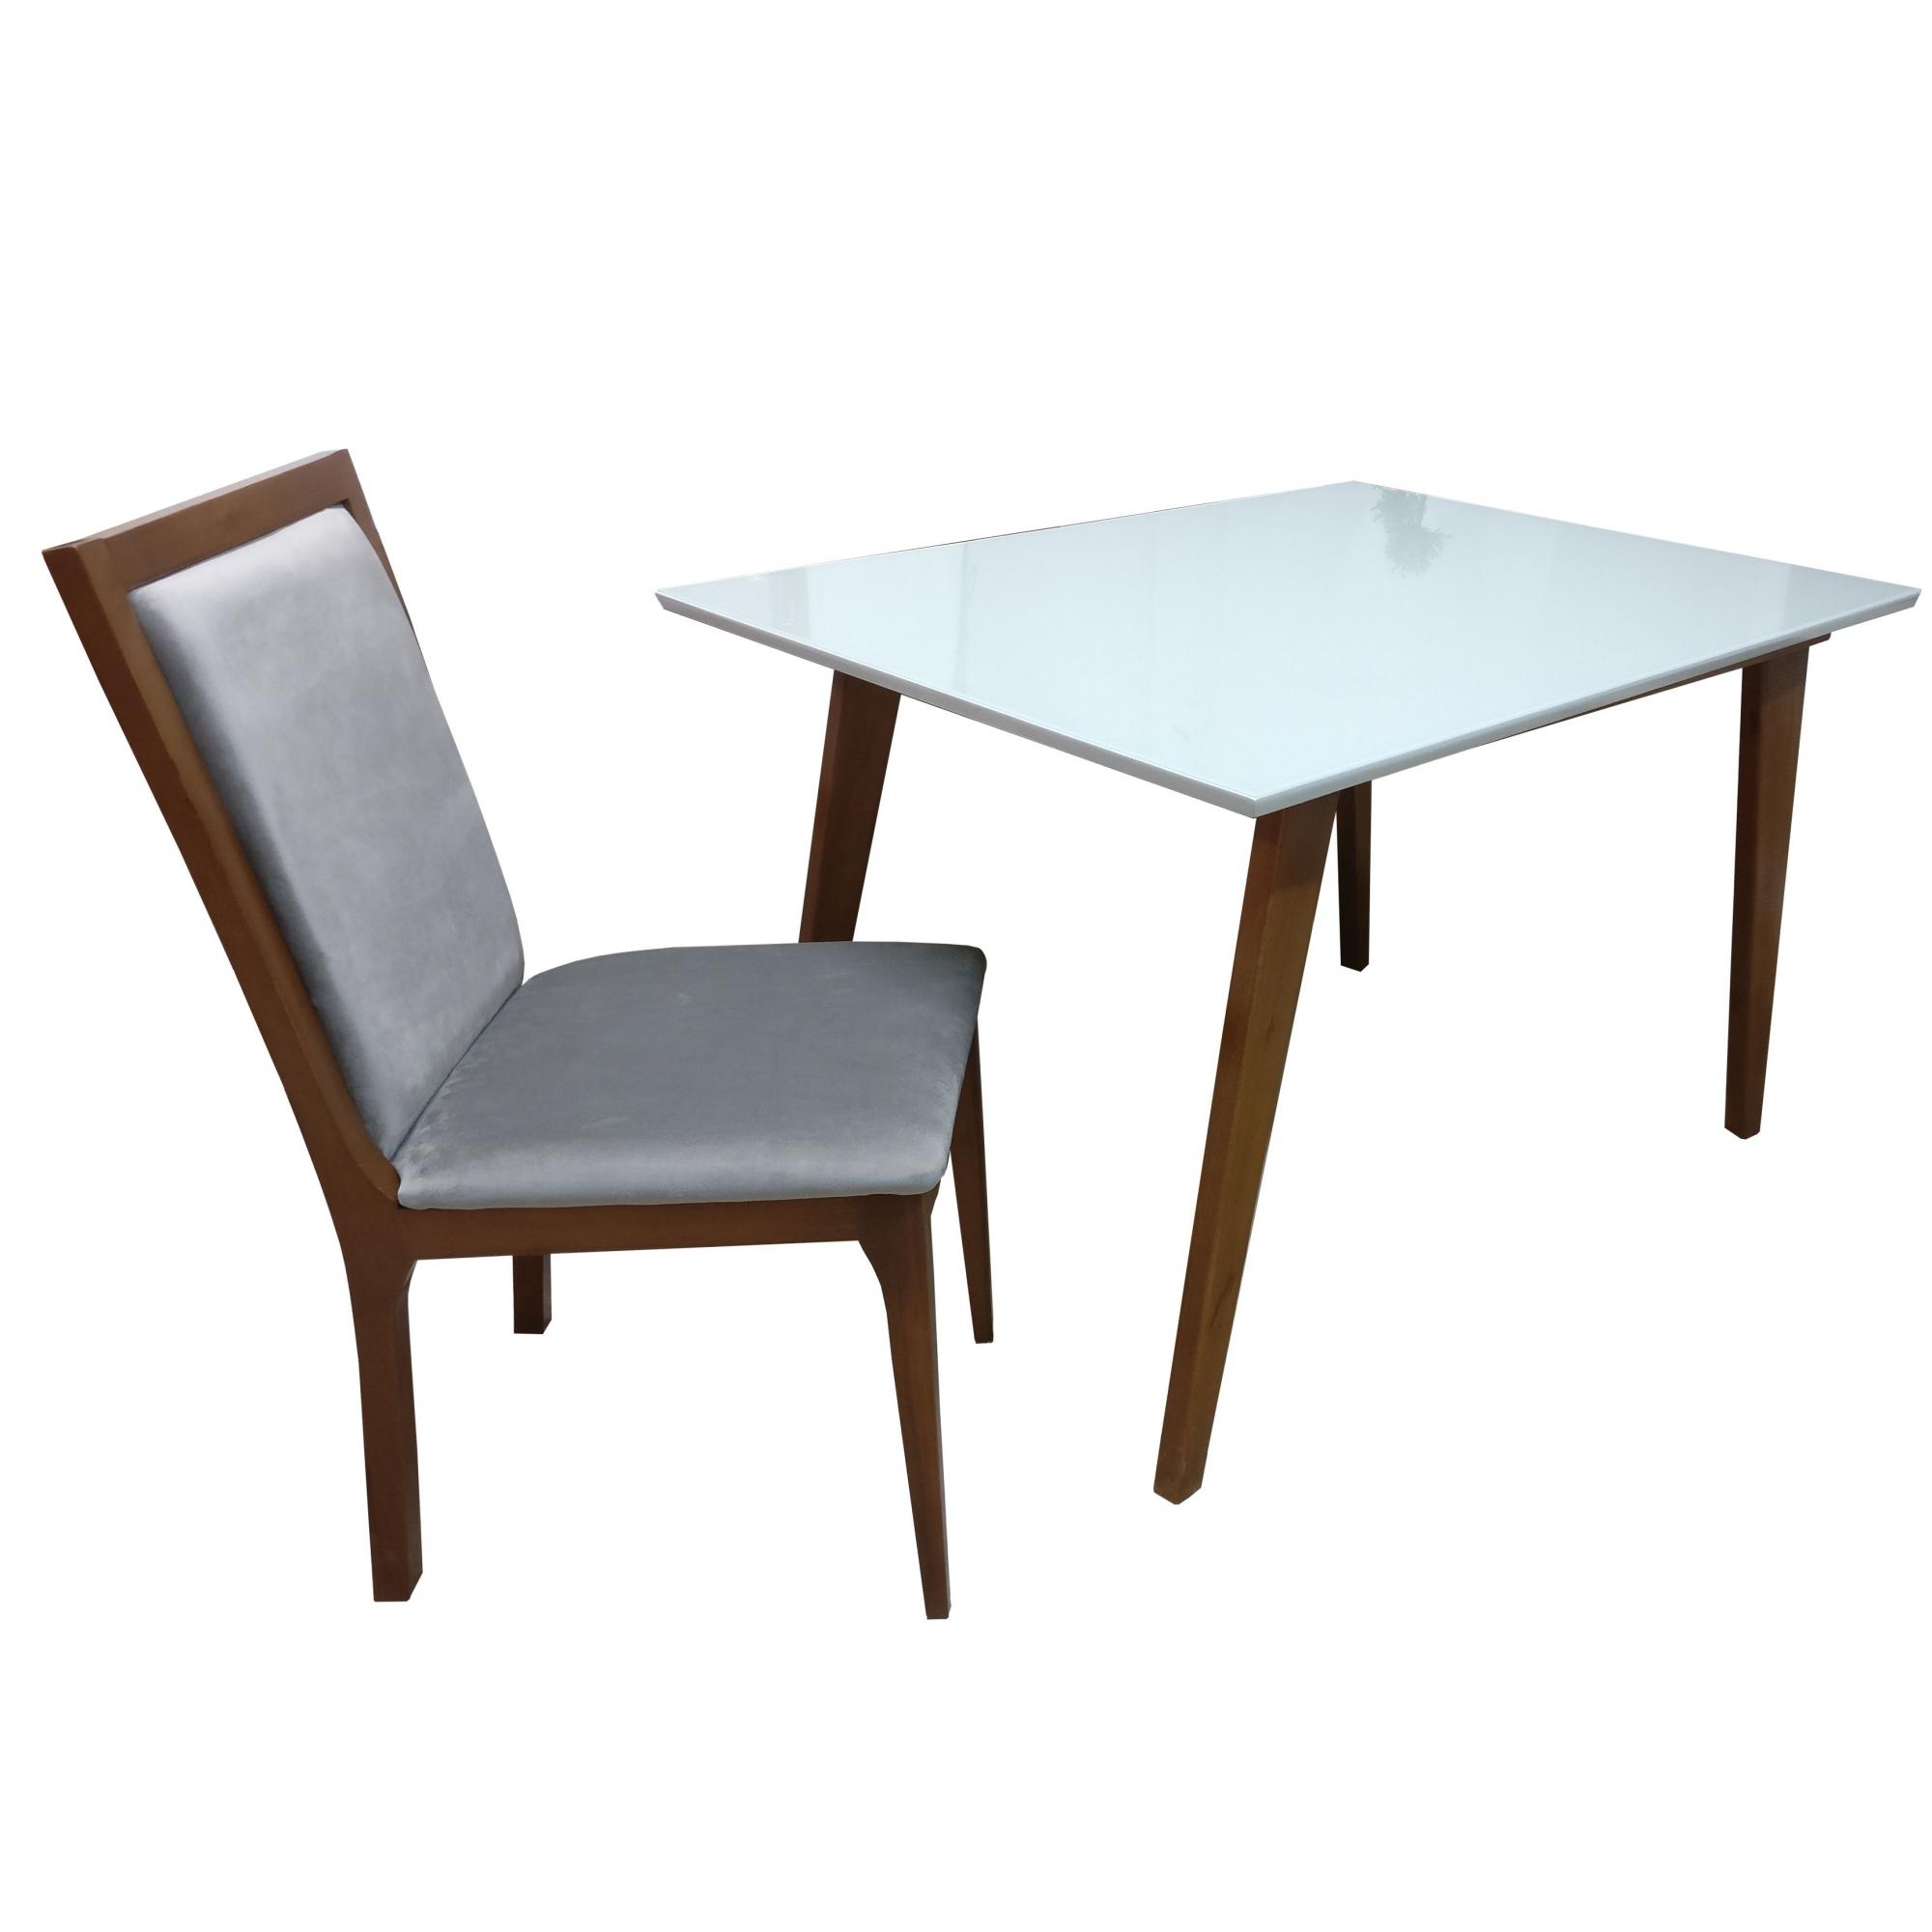 Kit 2 Cadeira Jantar Grécia Mesa Sala Jantar Ambiente Decor